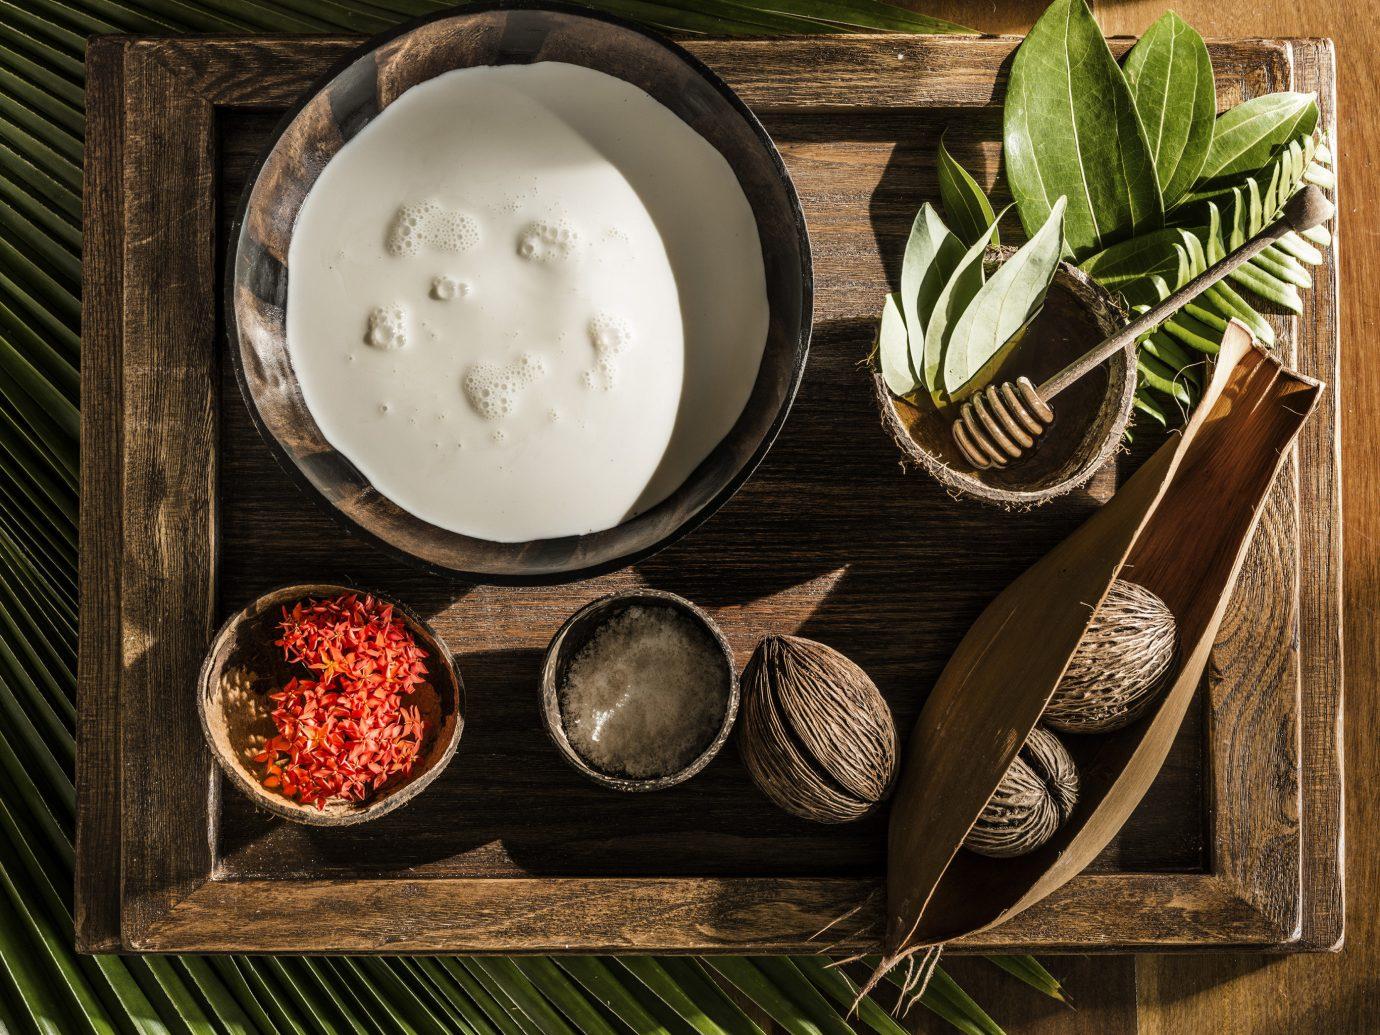 Trip Ideas food produce flower flavor herb meal